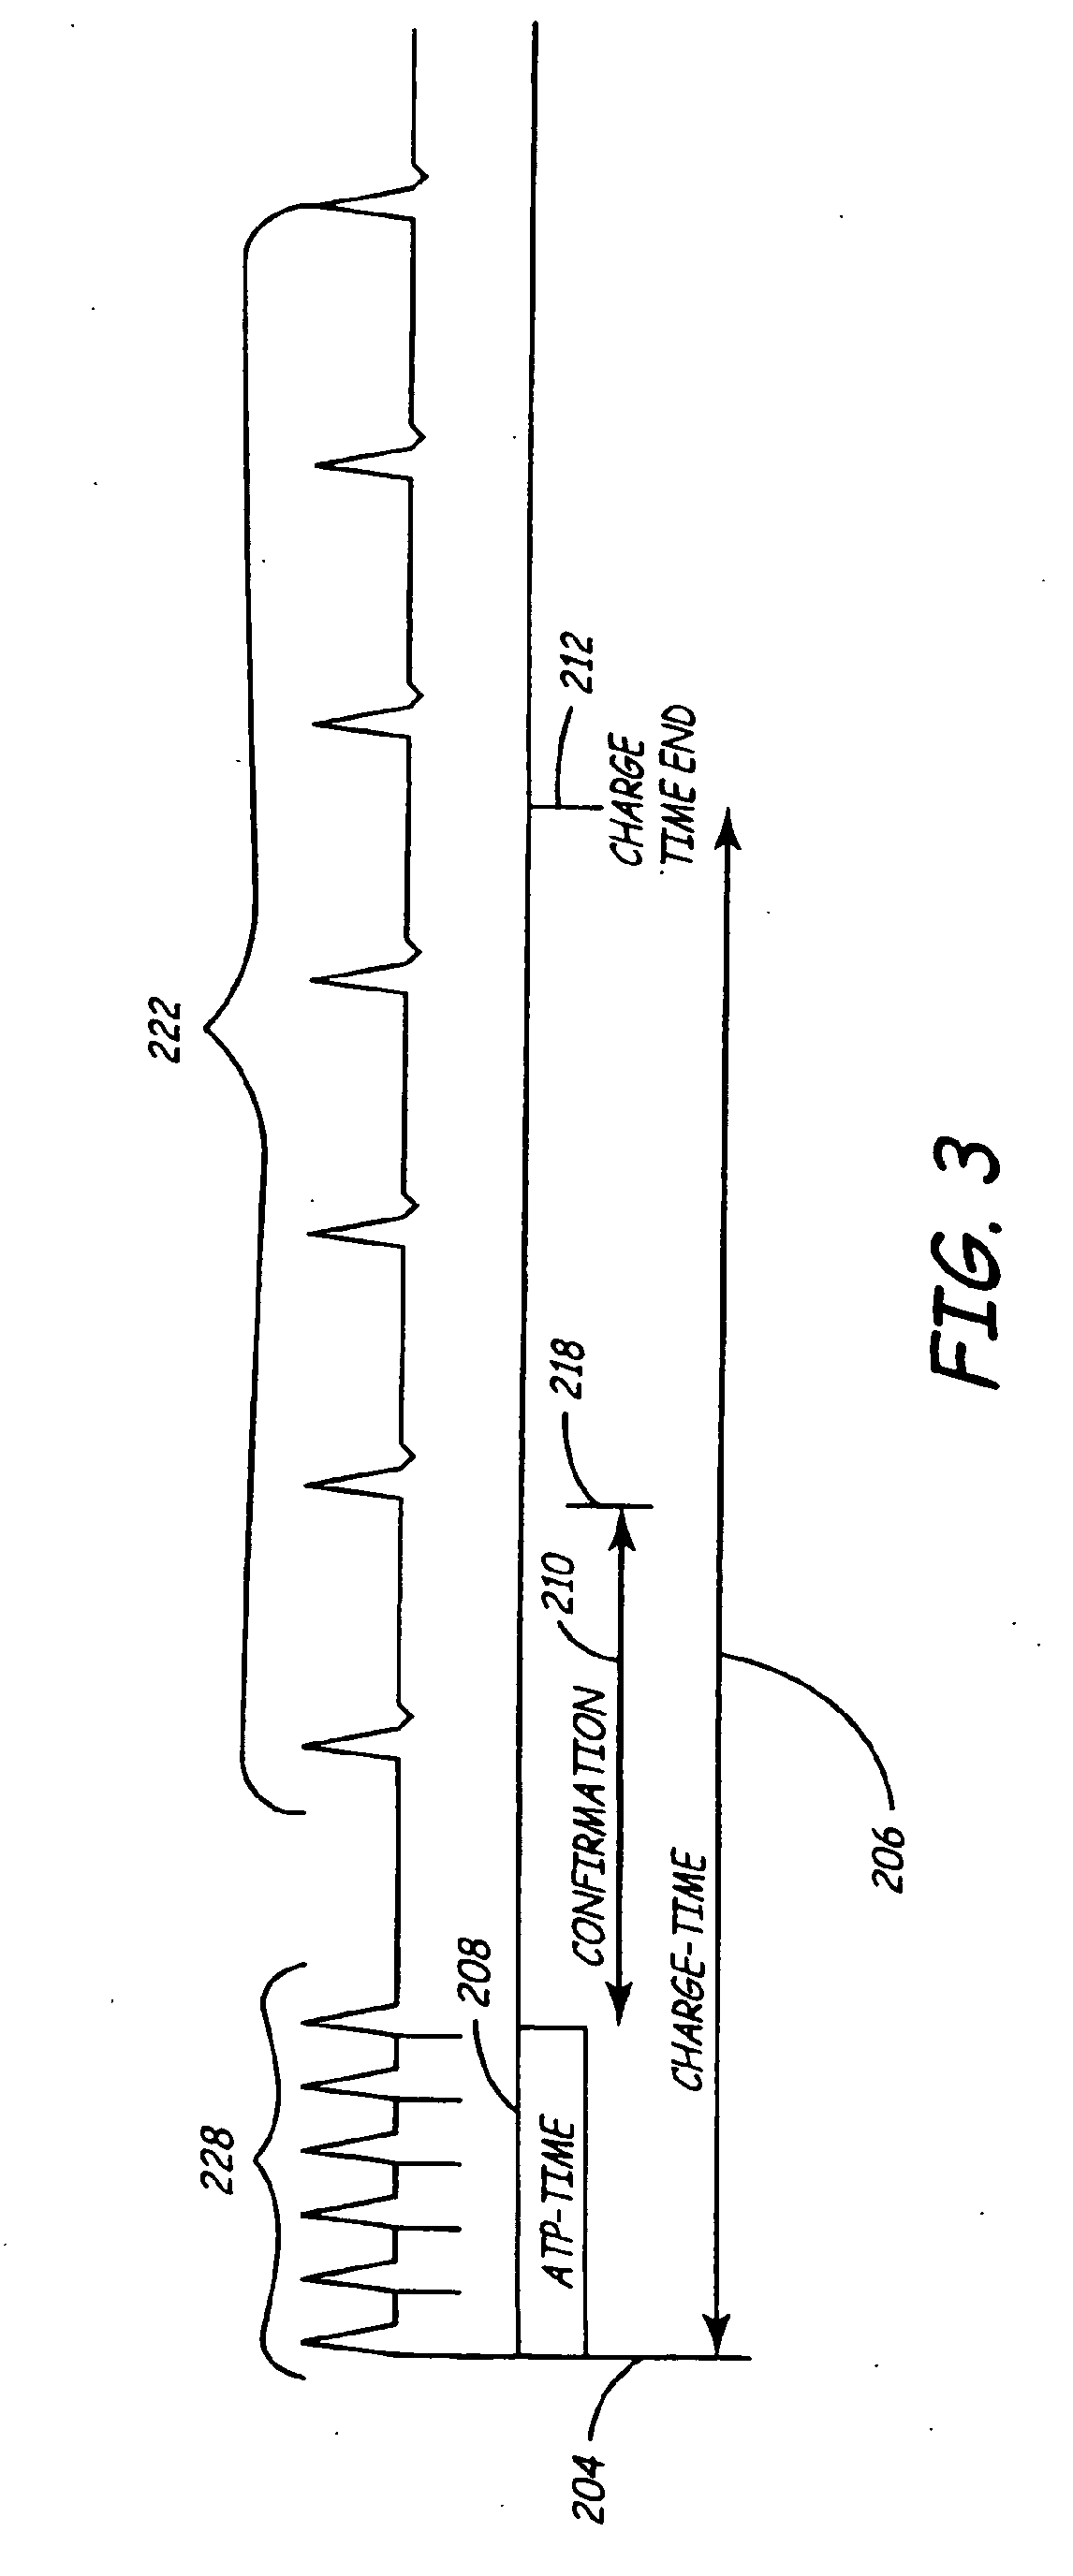 patent ep1501600b1 kombinierte antitachykardie. Black Bedroom Furniture Sets. Home Design Ideas